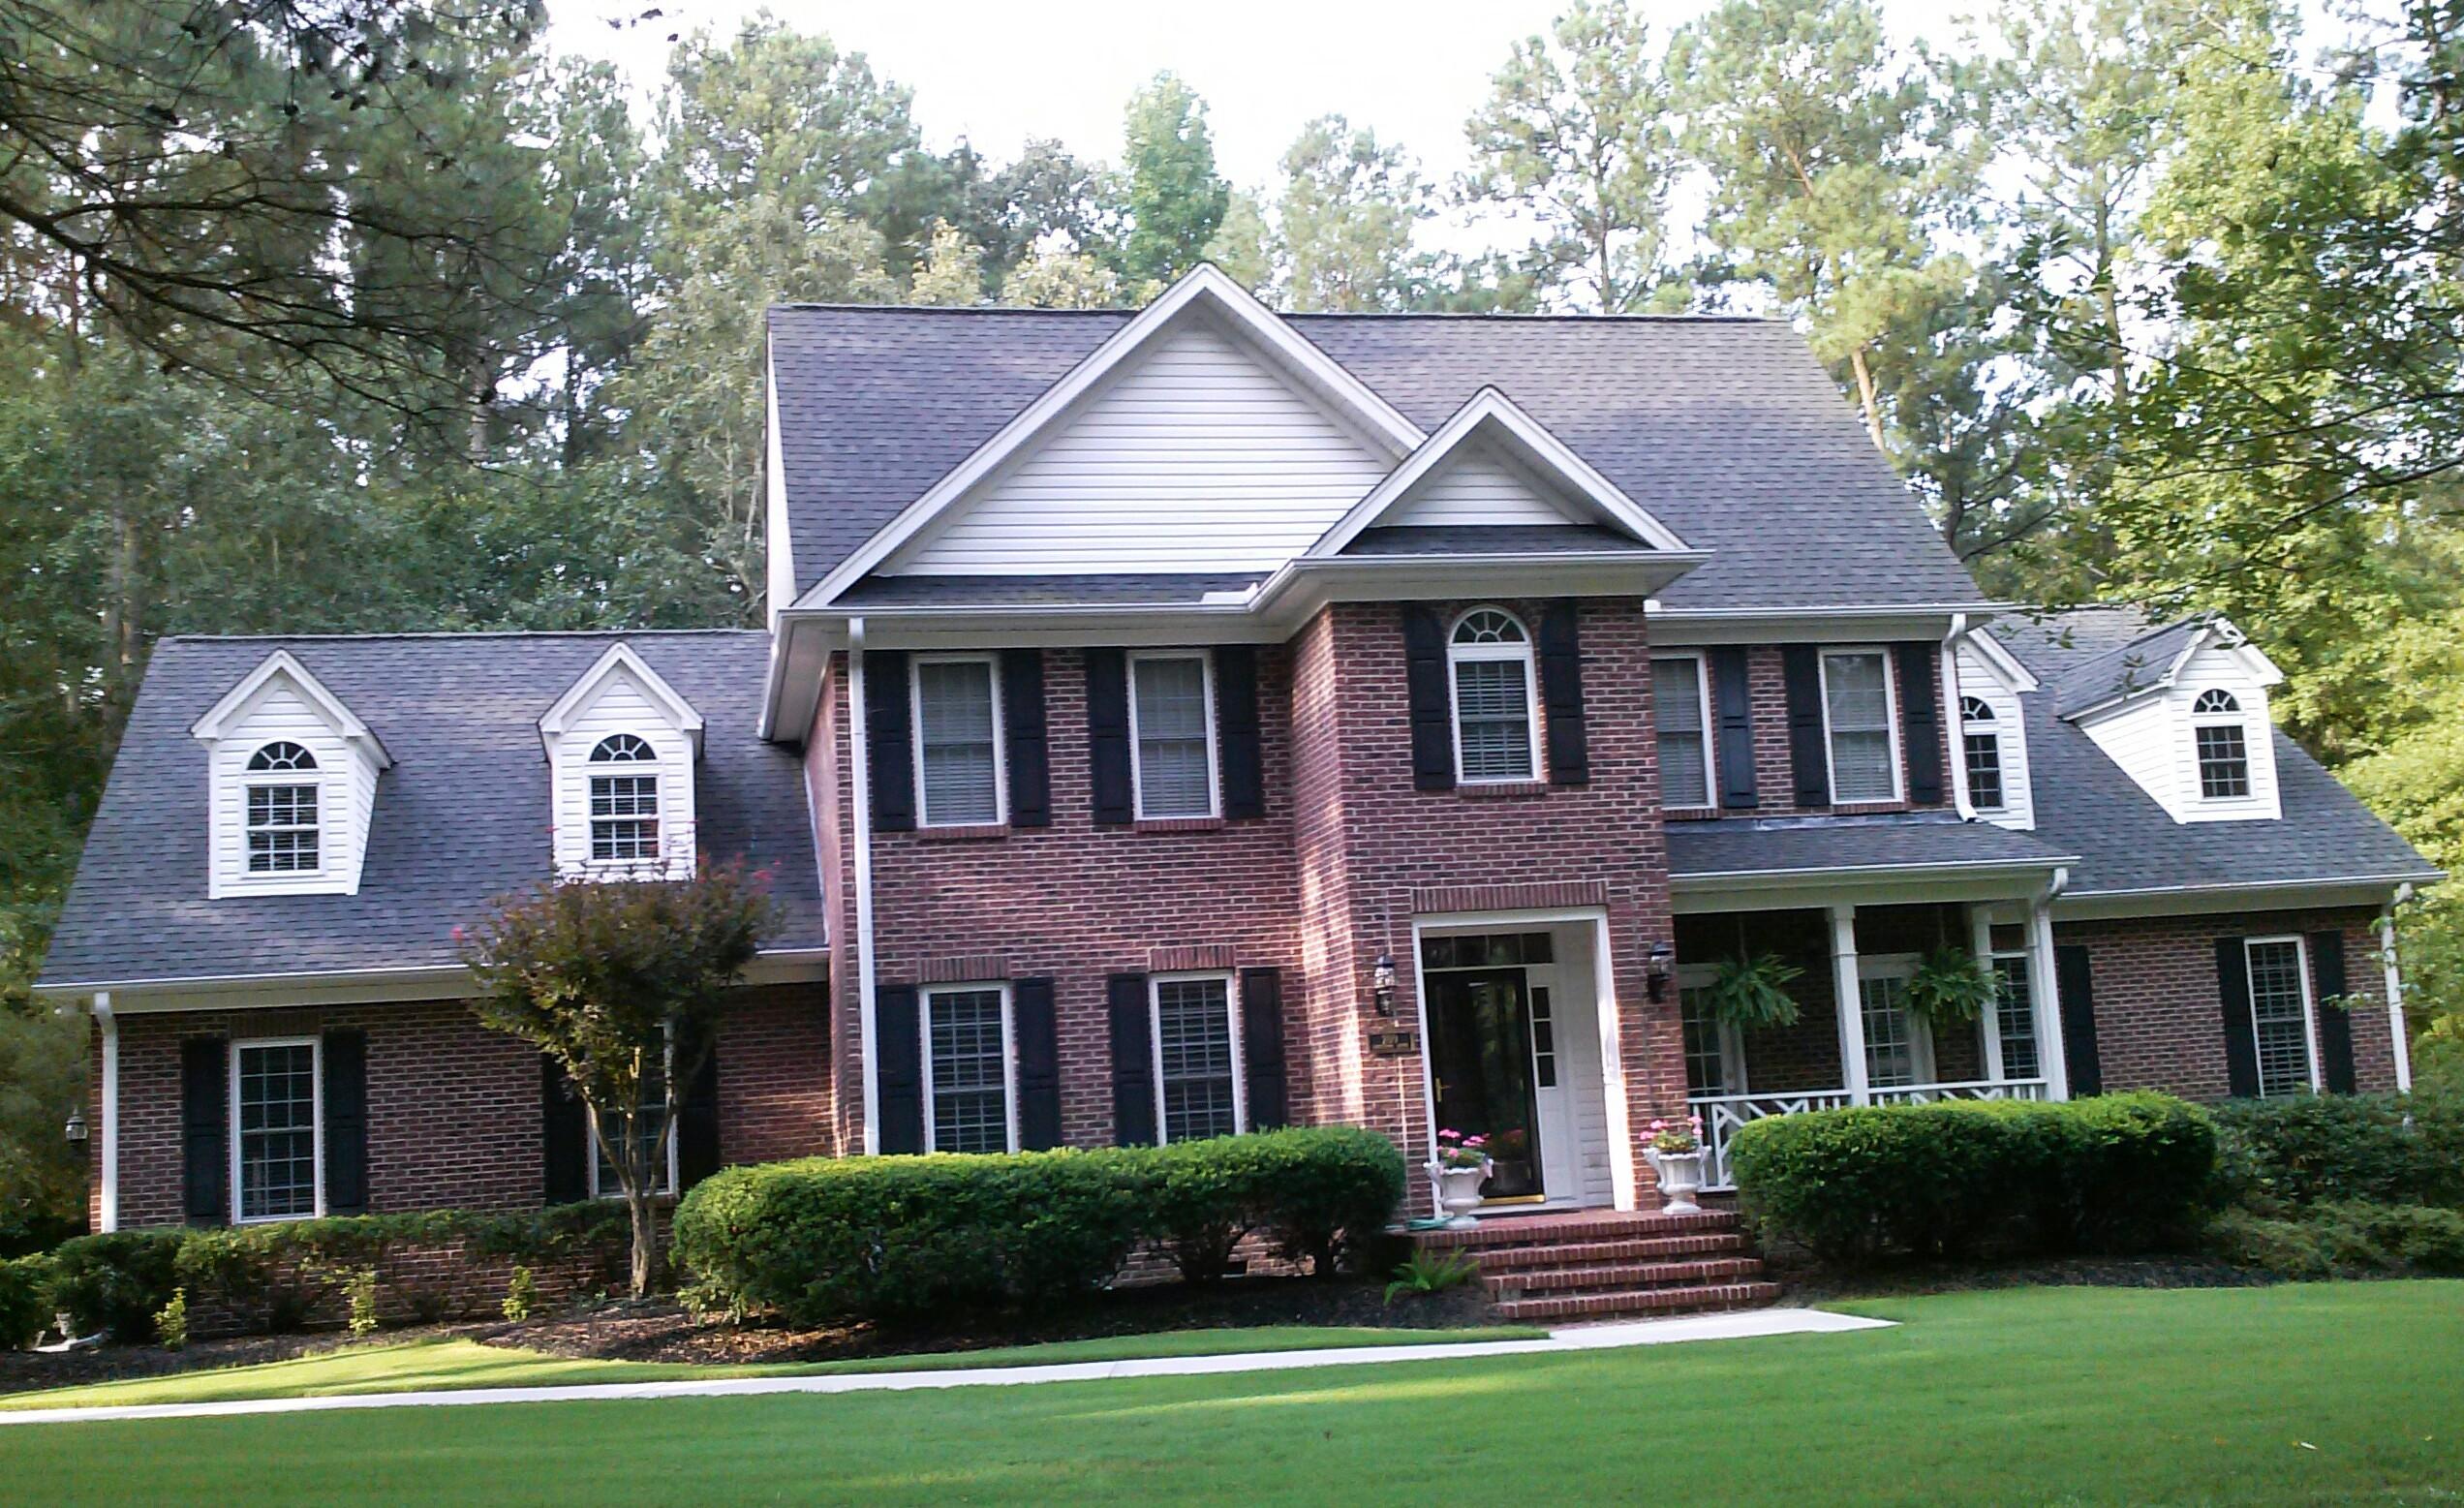 209 Lakestone Drive, Rockingham, North Carolina 28379